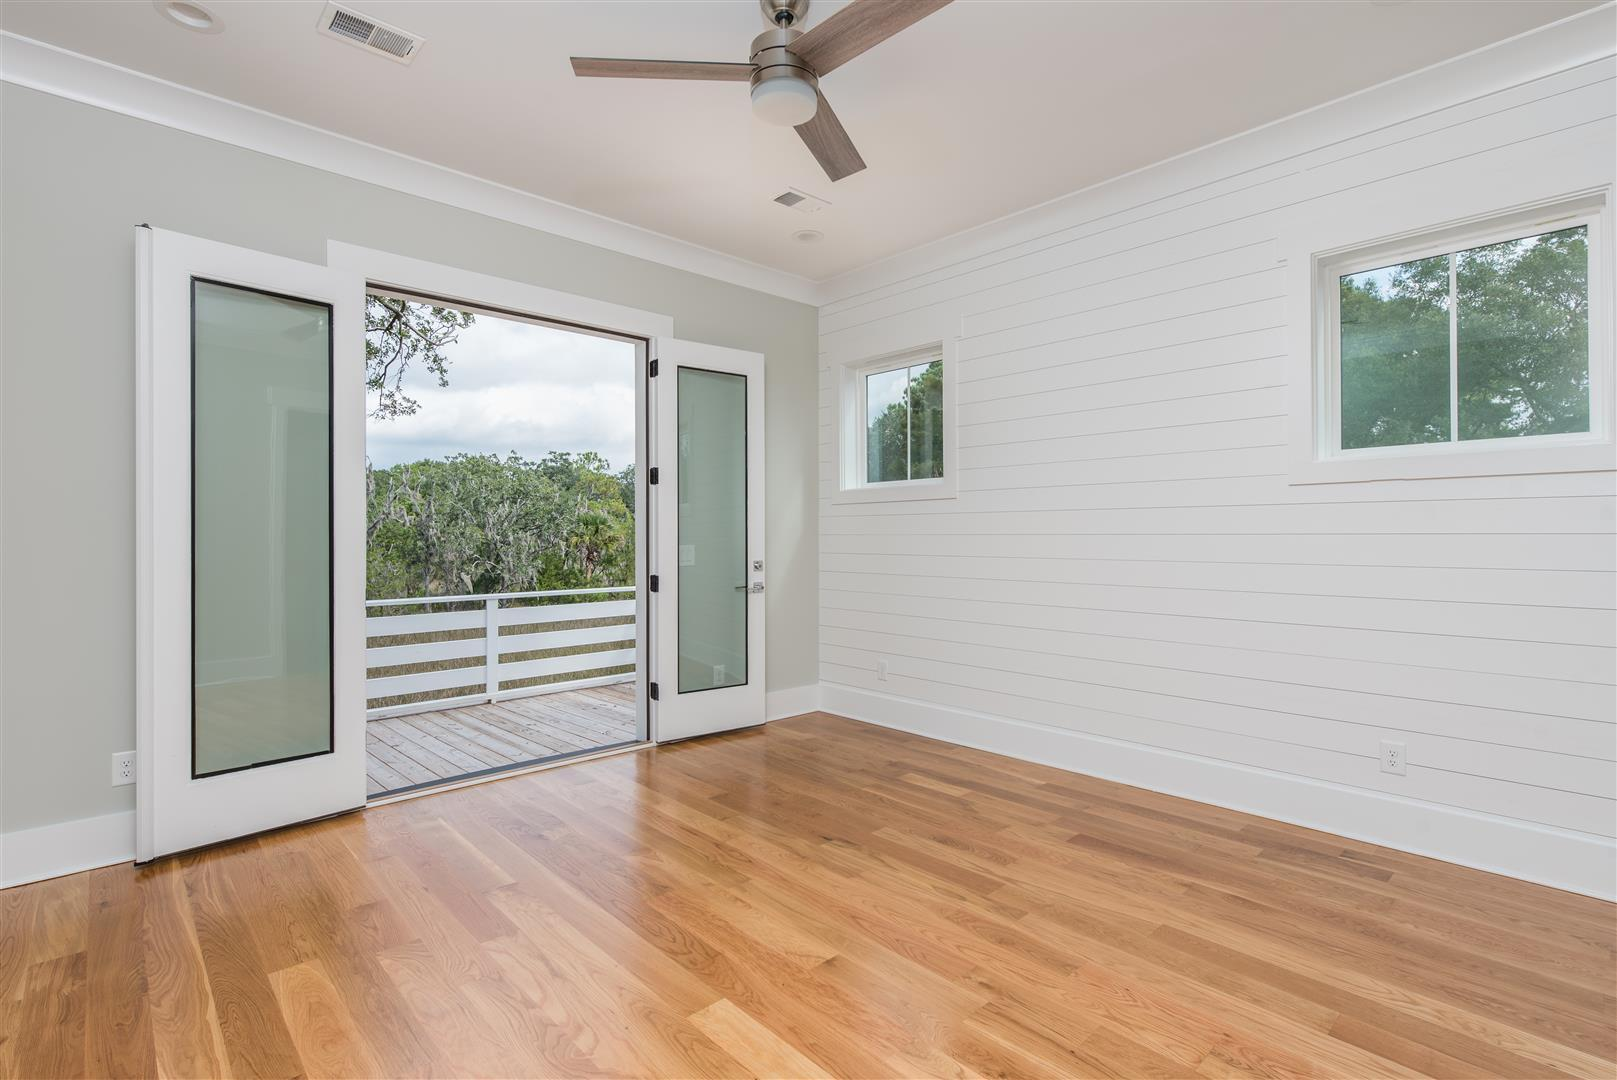 Scanlonville Homes For Sale - 160 5th, Mount Pleasant, SC - 3